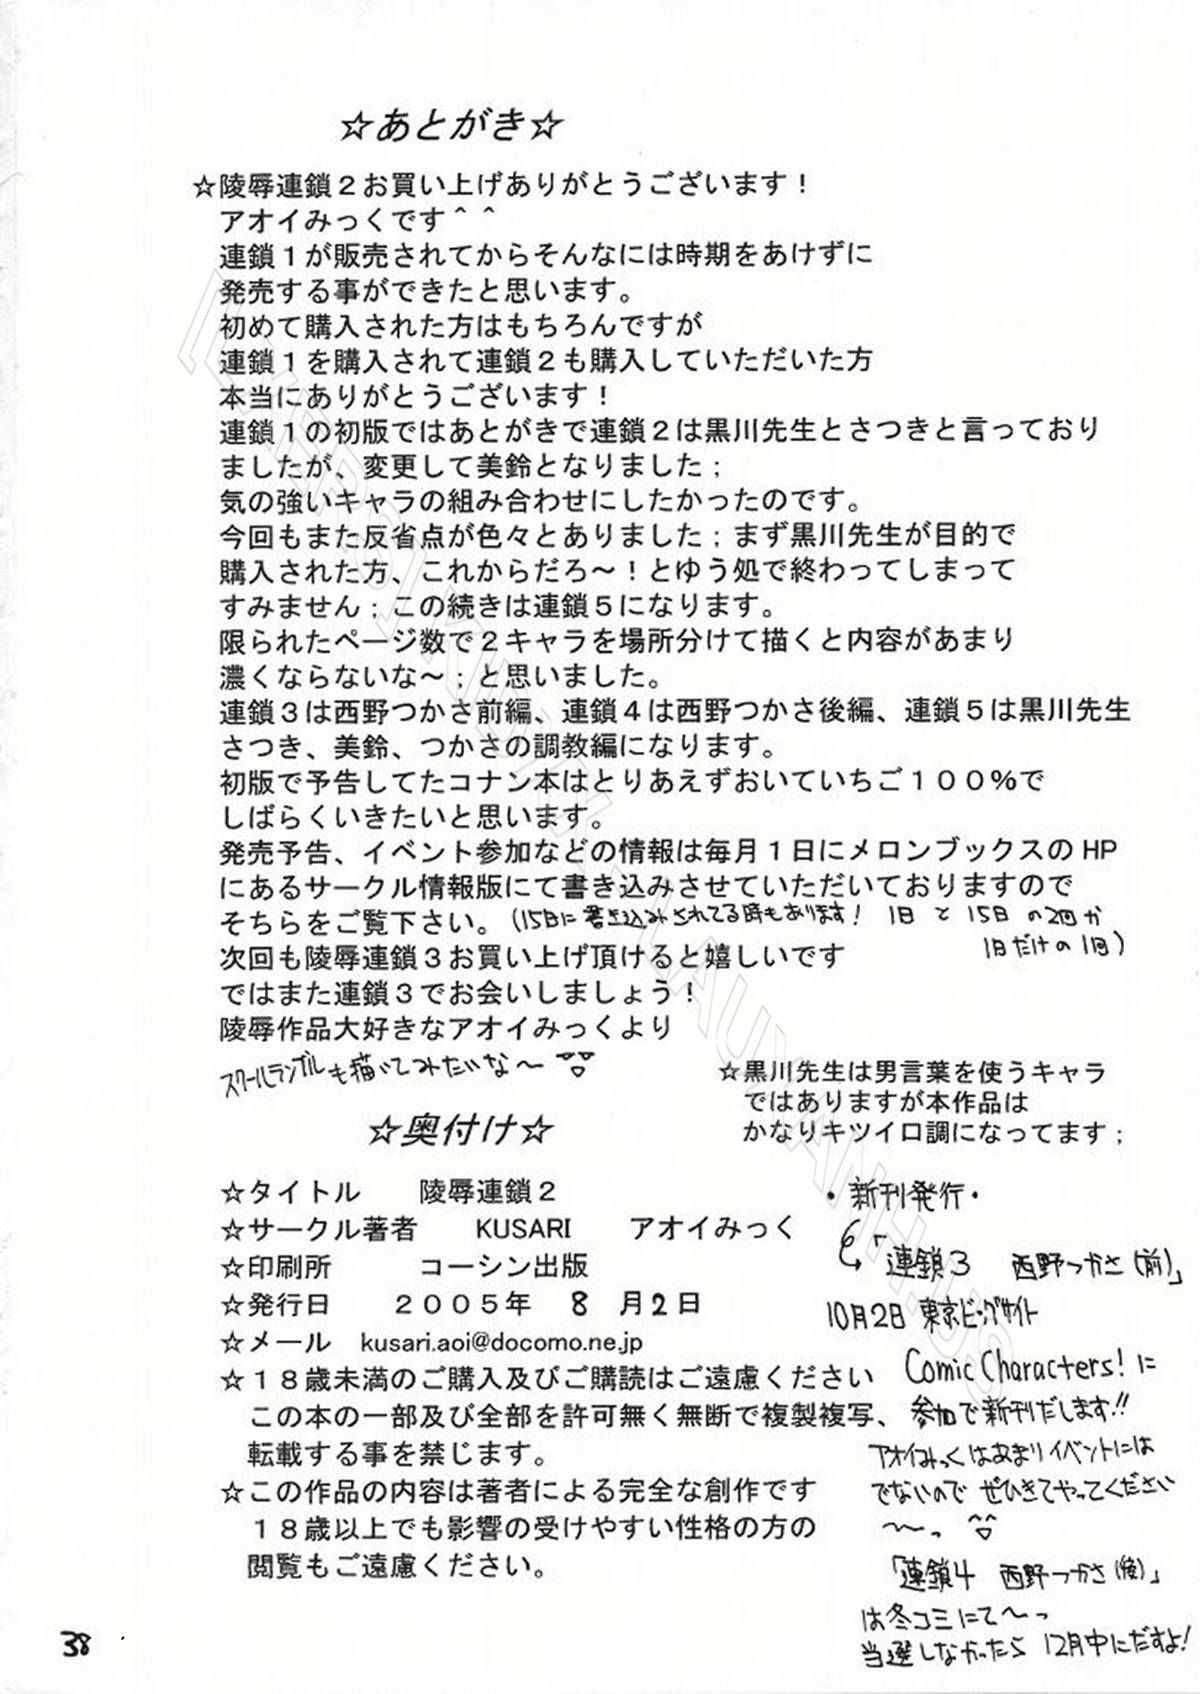 TruyenHay.Com - Ảnh 37 - Ryoujoku Rensa Chapter 2